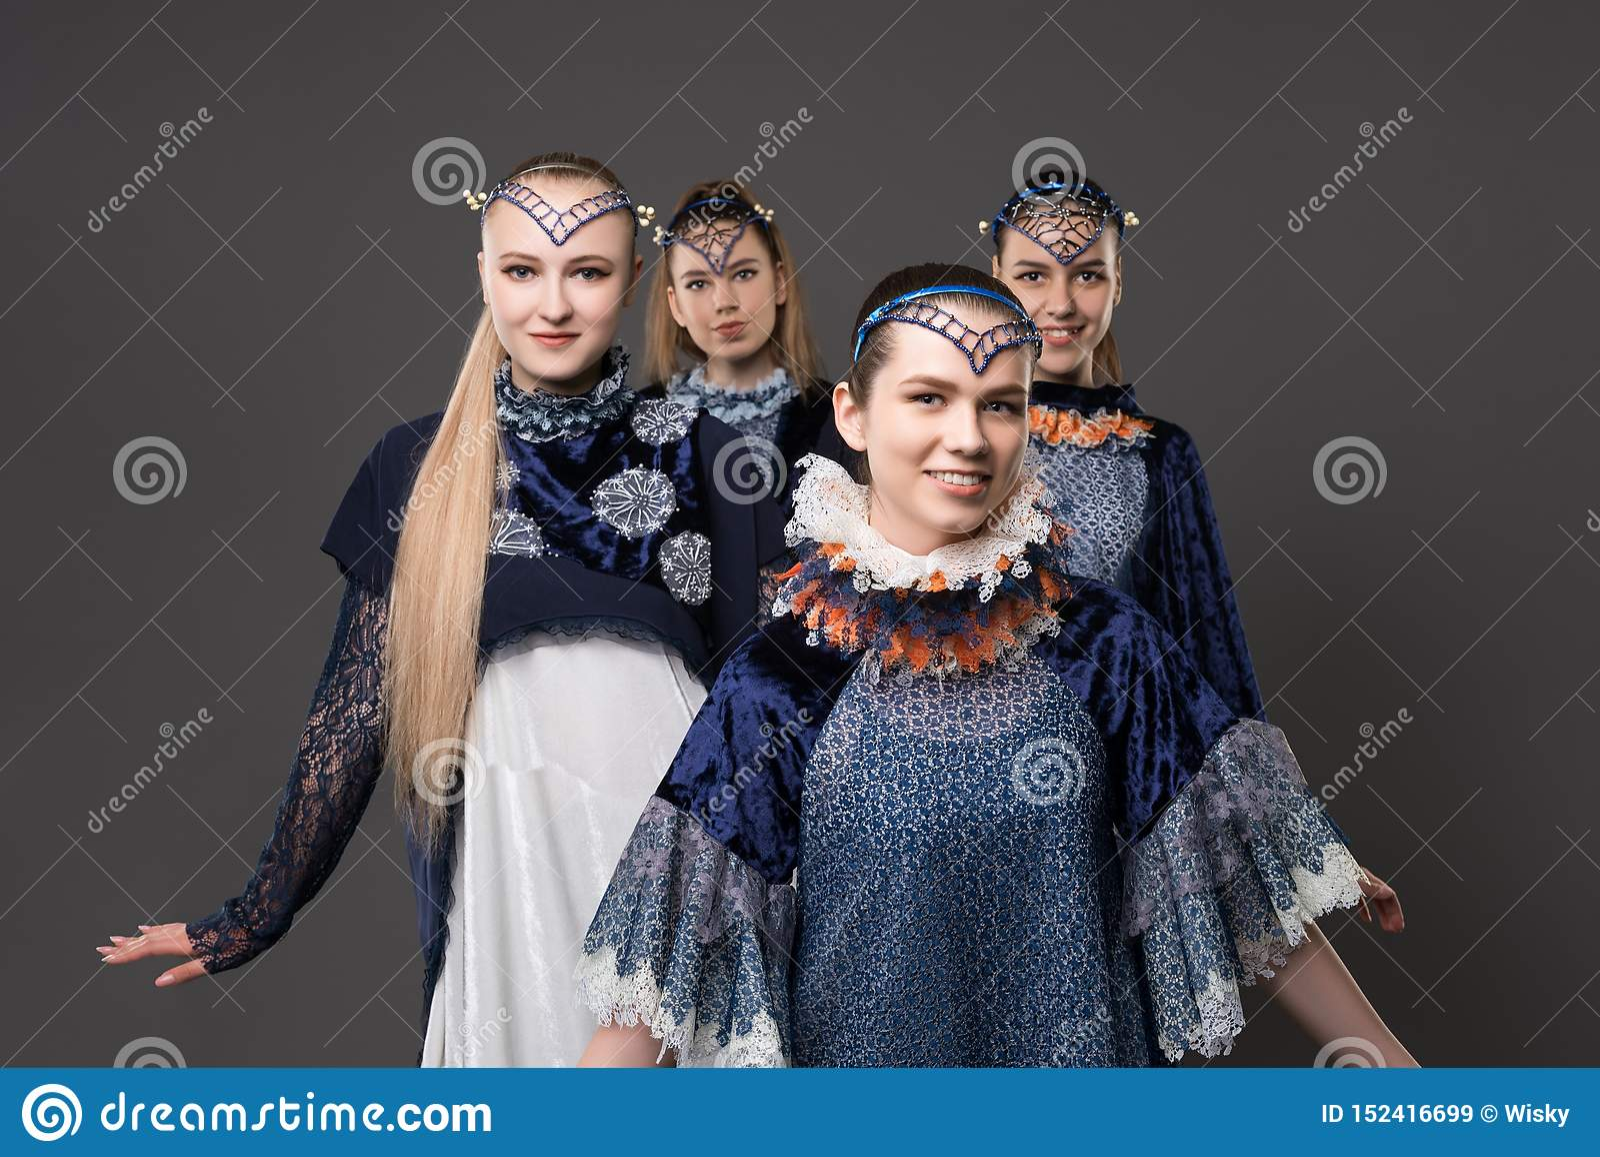 Shot of pretty girls in design dresses